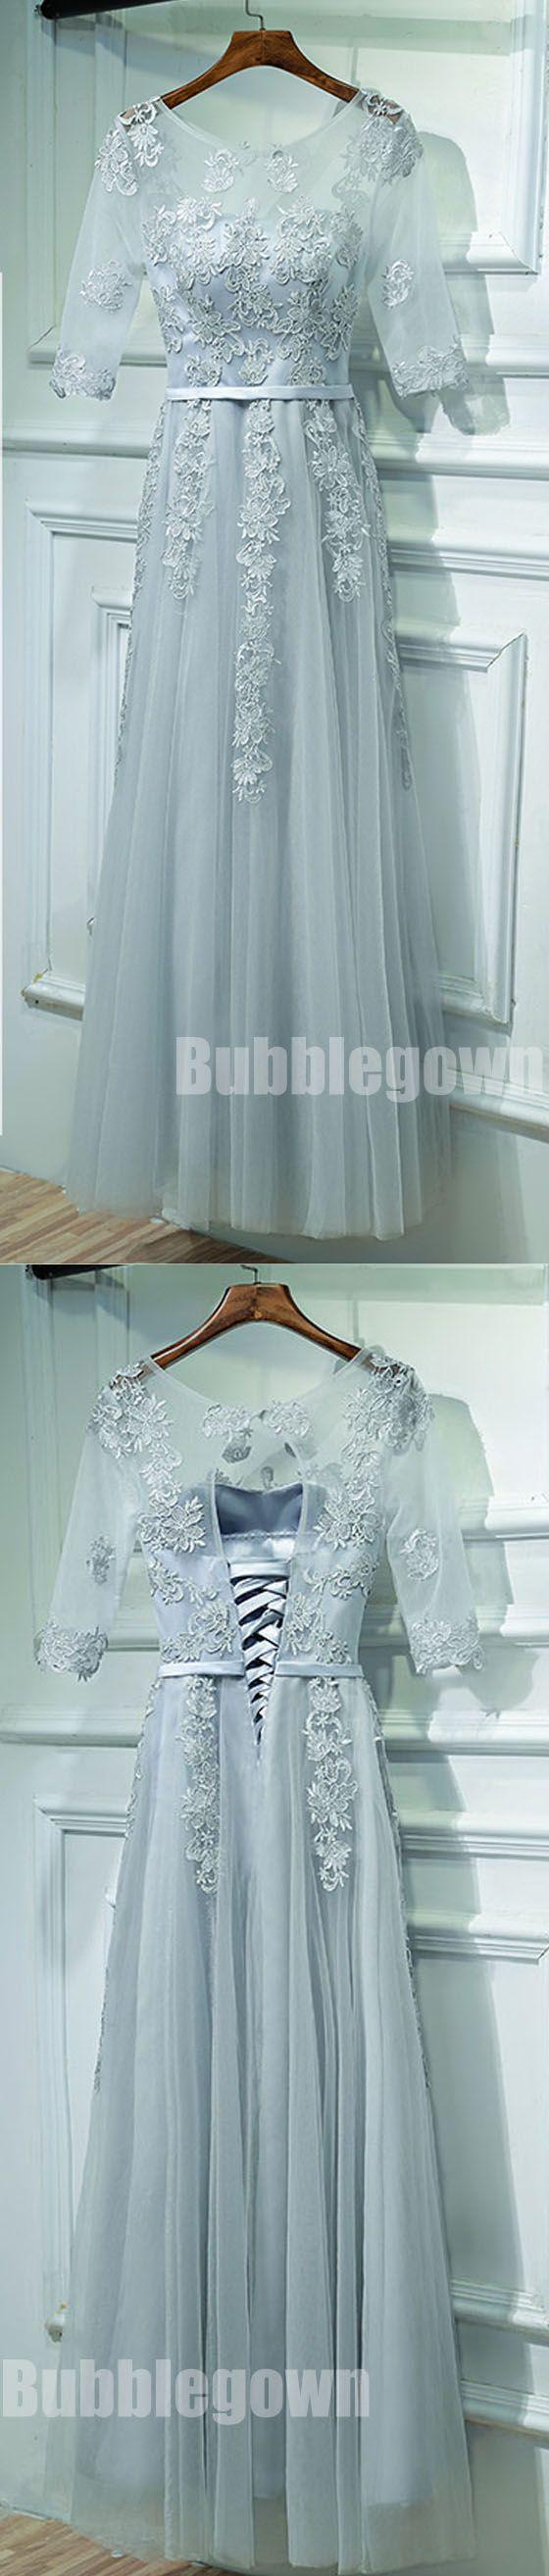 Half Sleeves Formal Tulle Applique Popular Long Prom Dresses, BGP015 #promdress